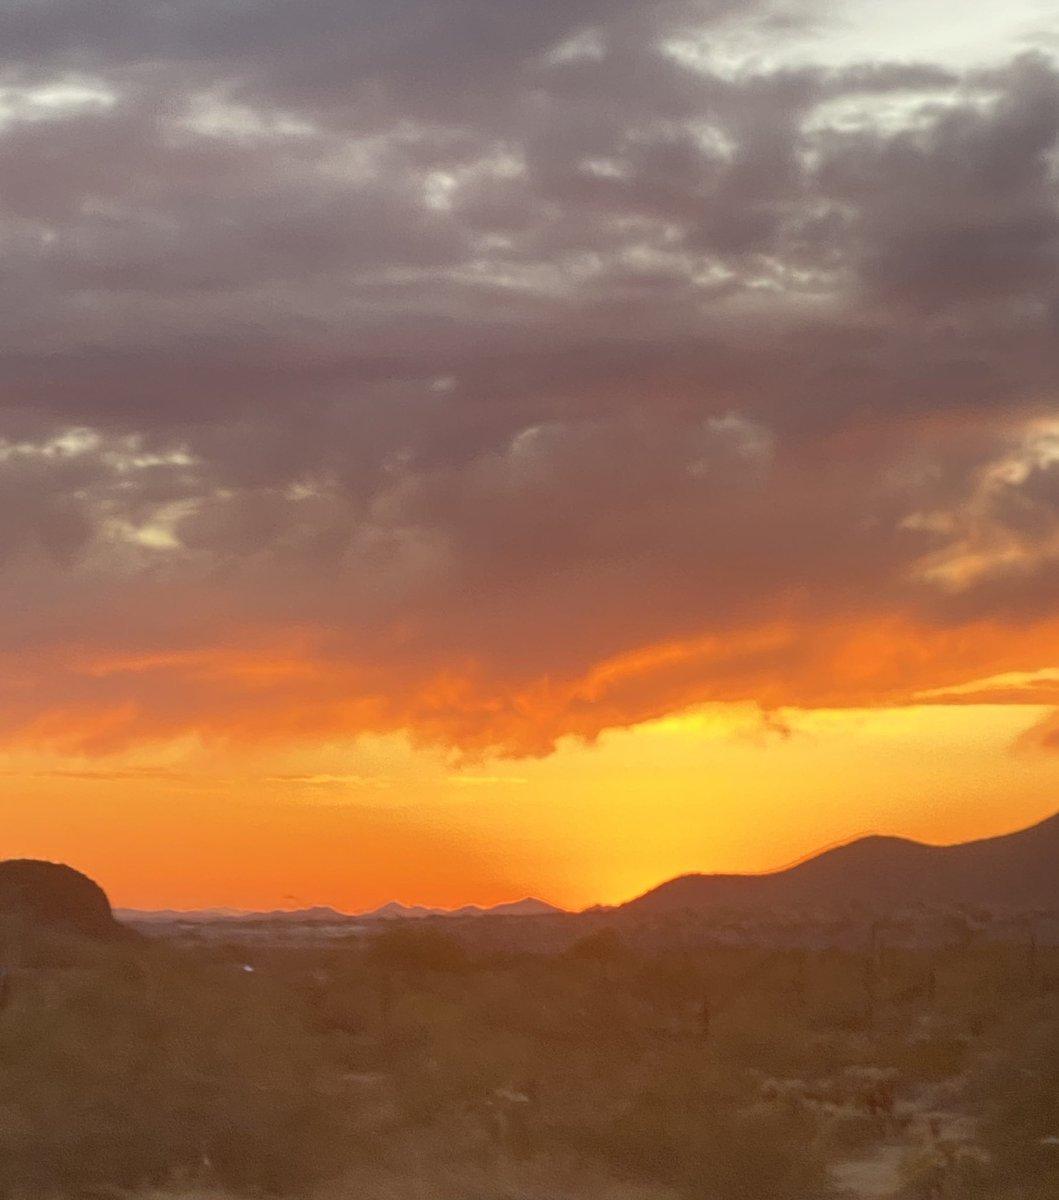 Fire in the sky #orange #sunset #Arizonapic.twitter.com/PoasCe3IQo